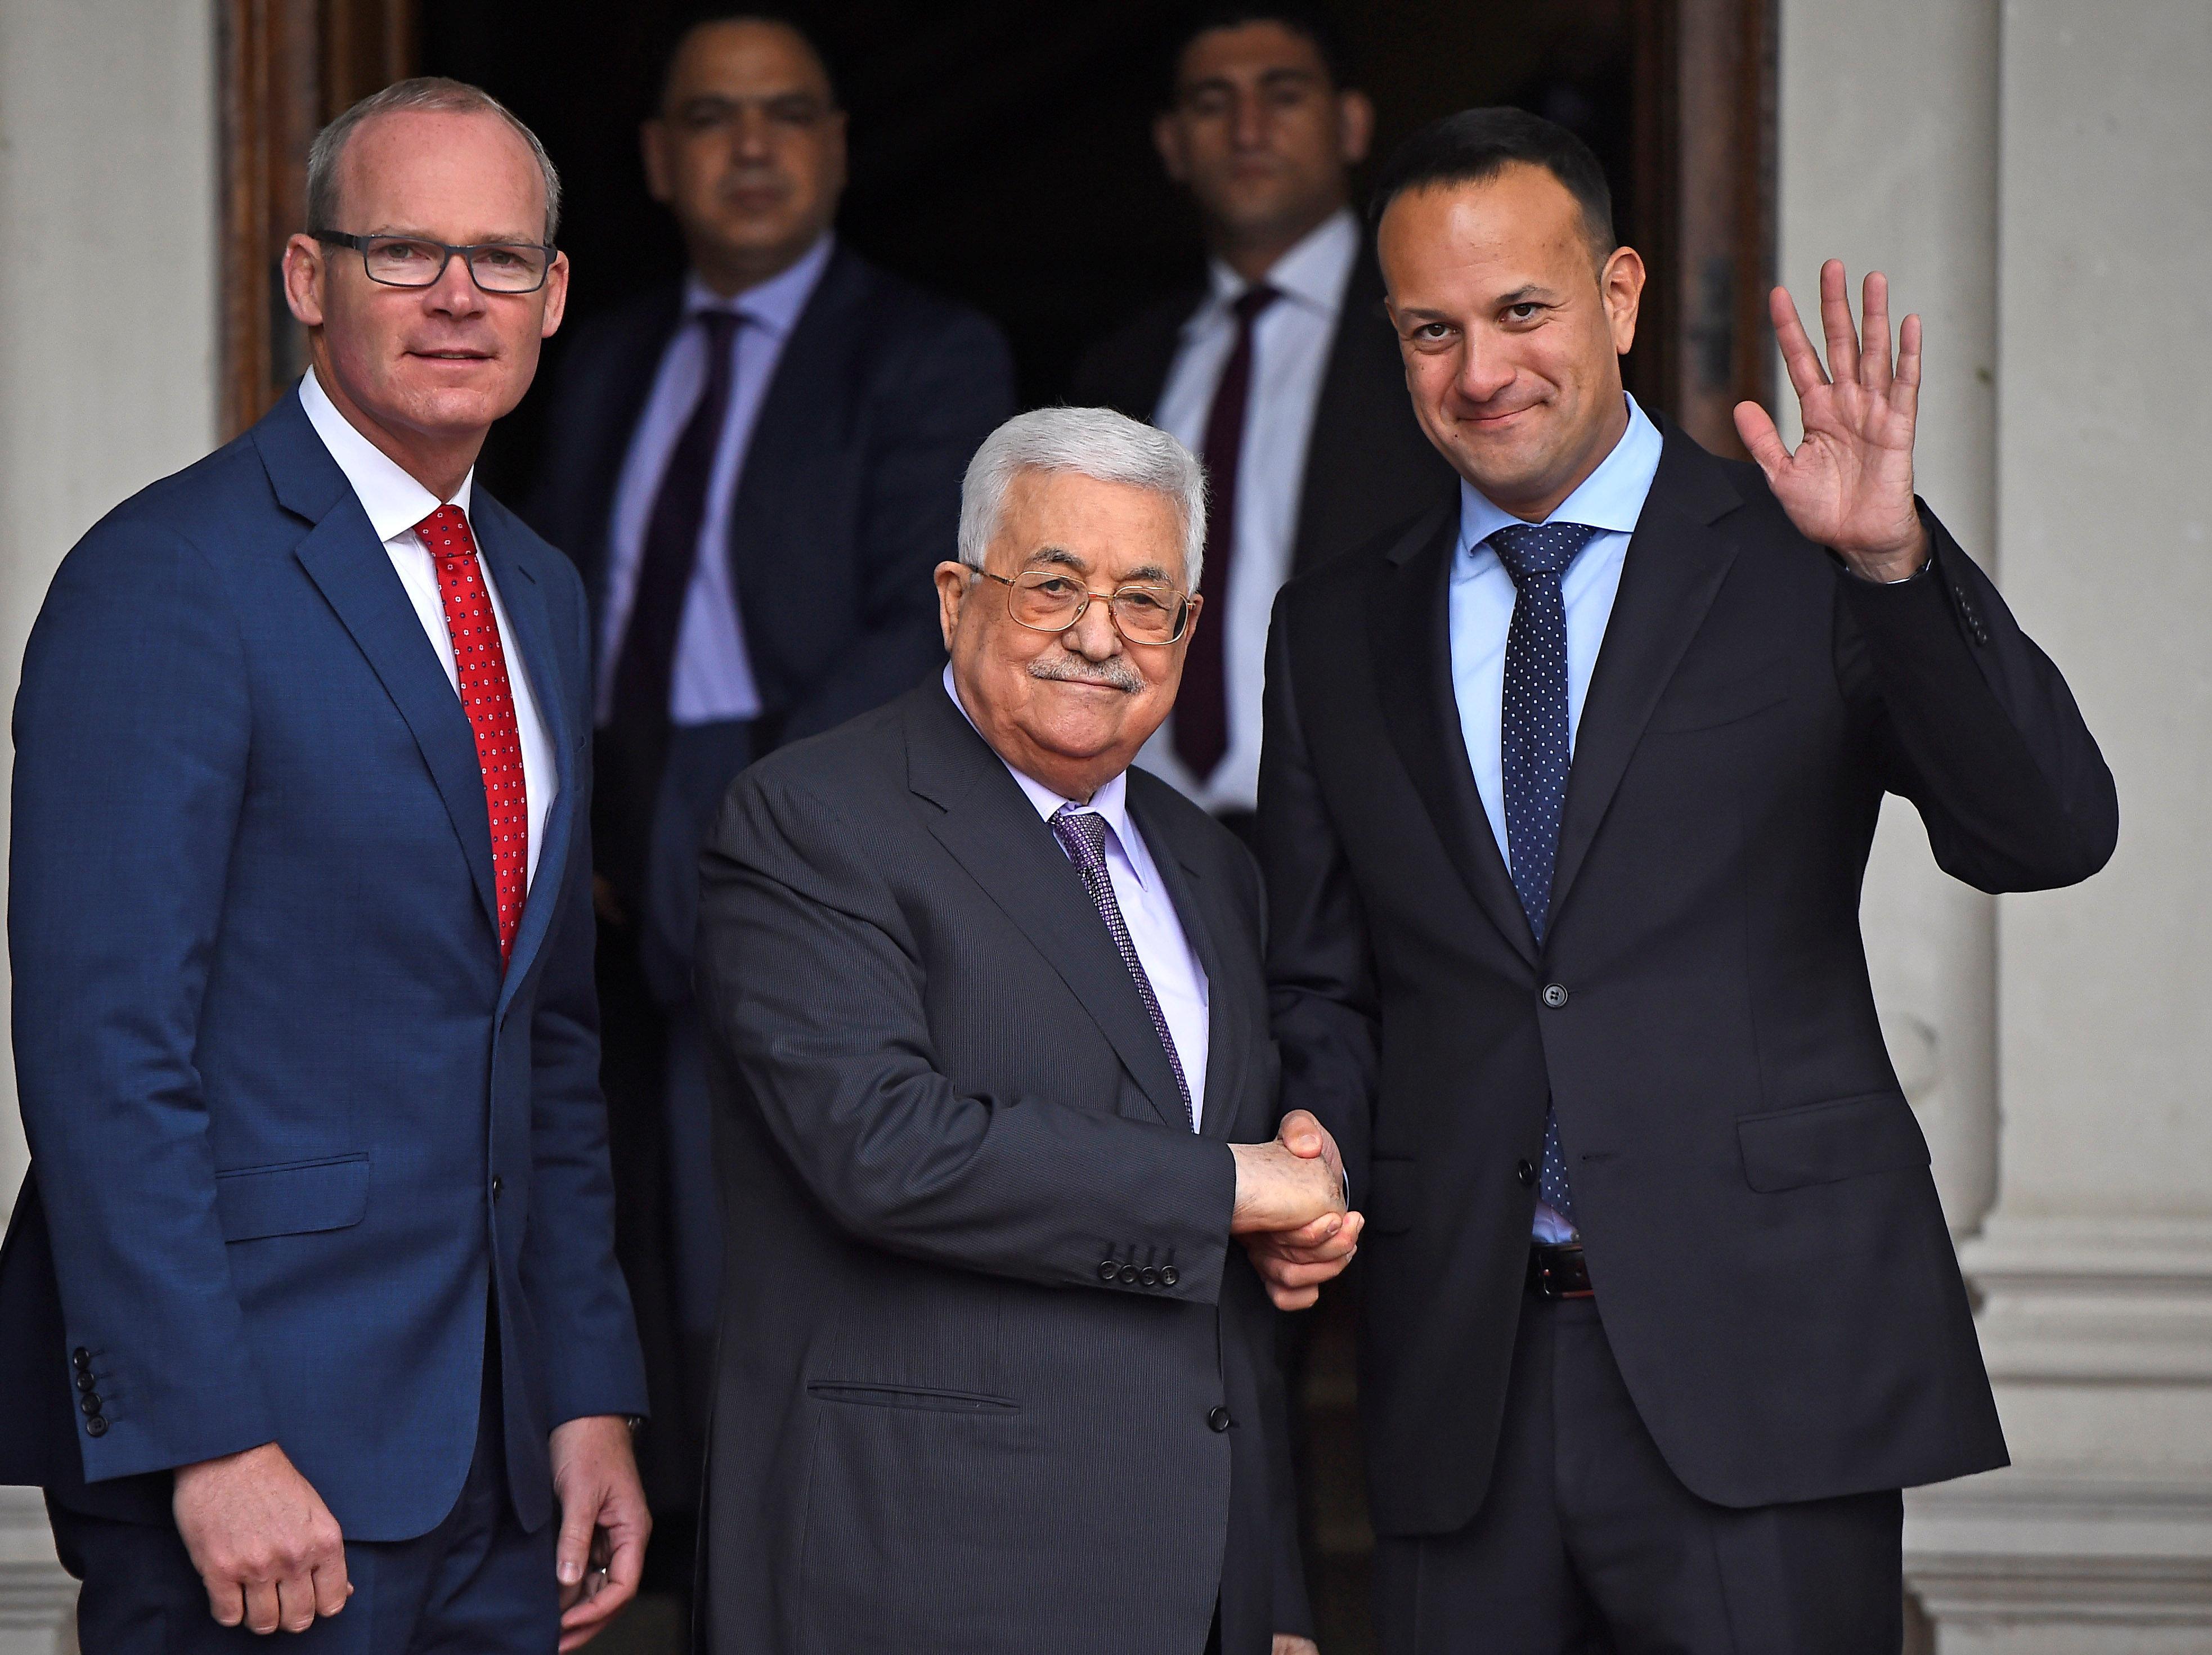 L'Irlande reconnaîtra la Palestine si les négociations continuent